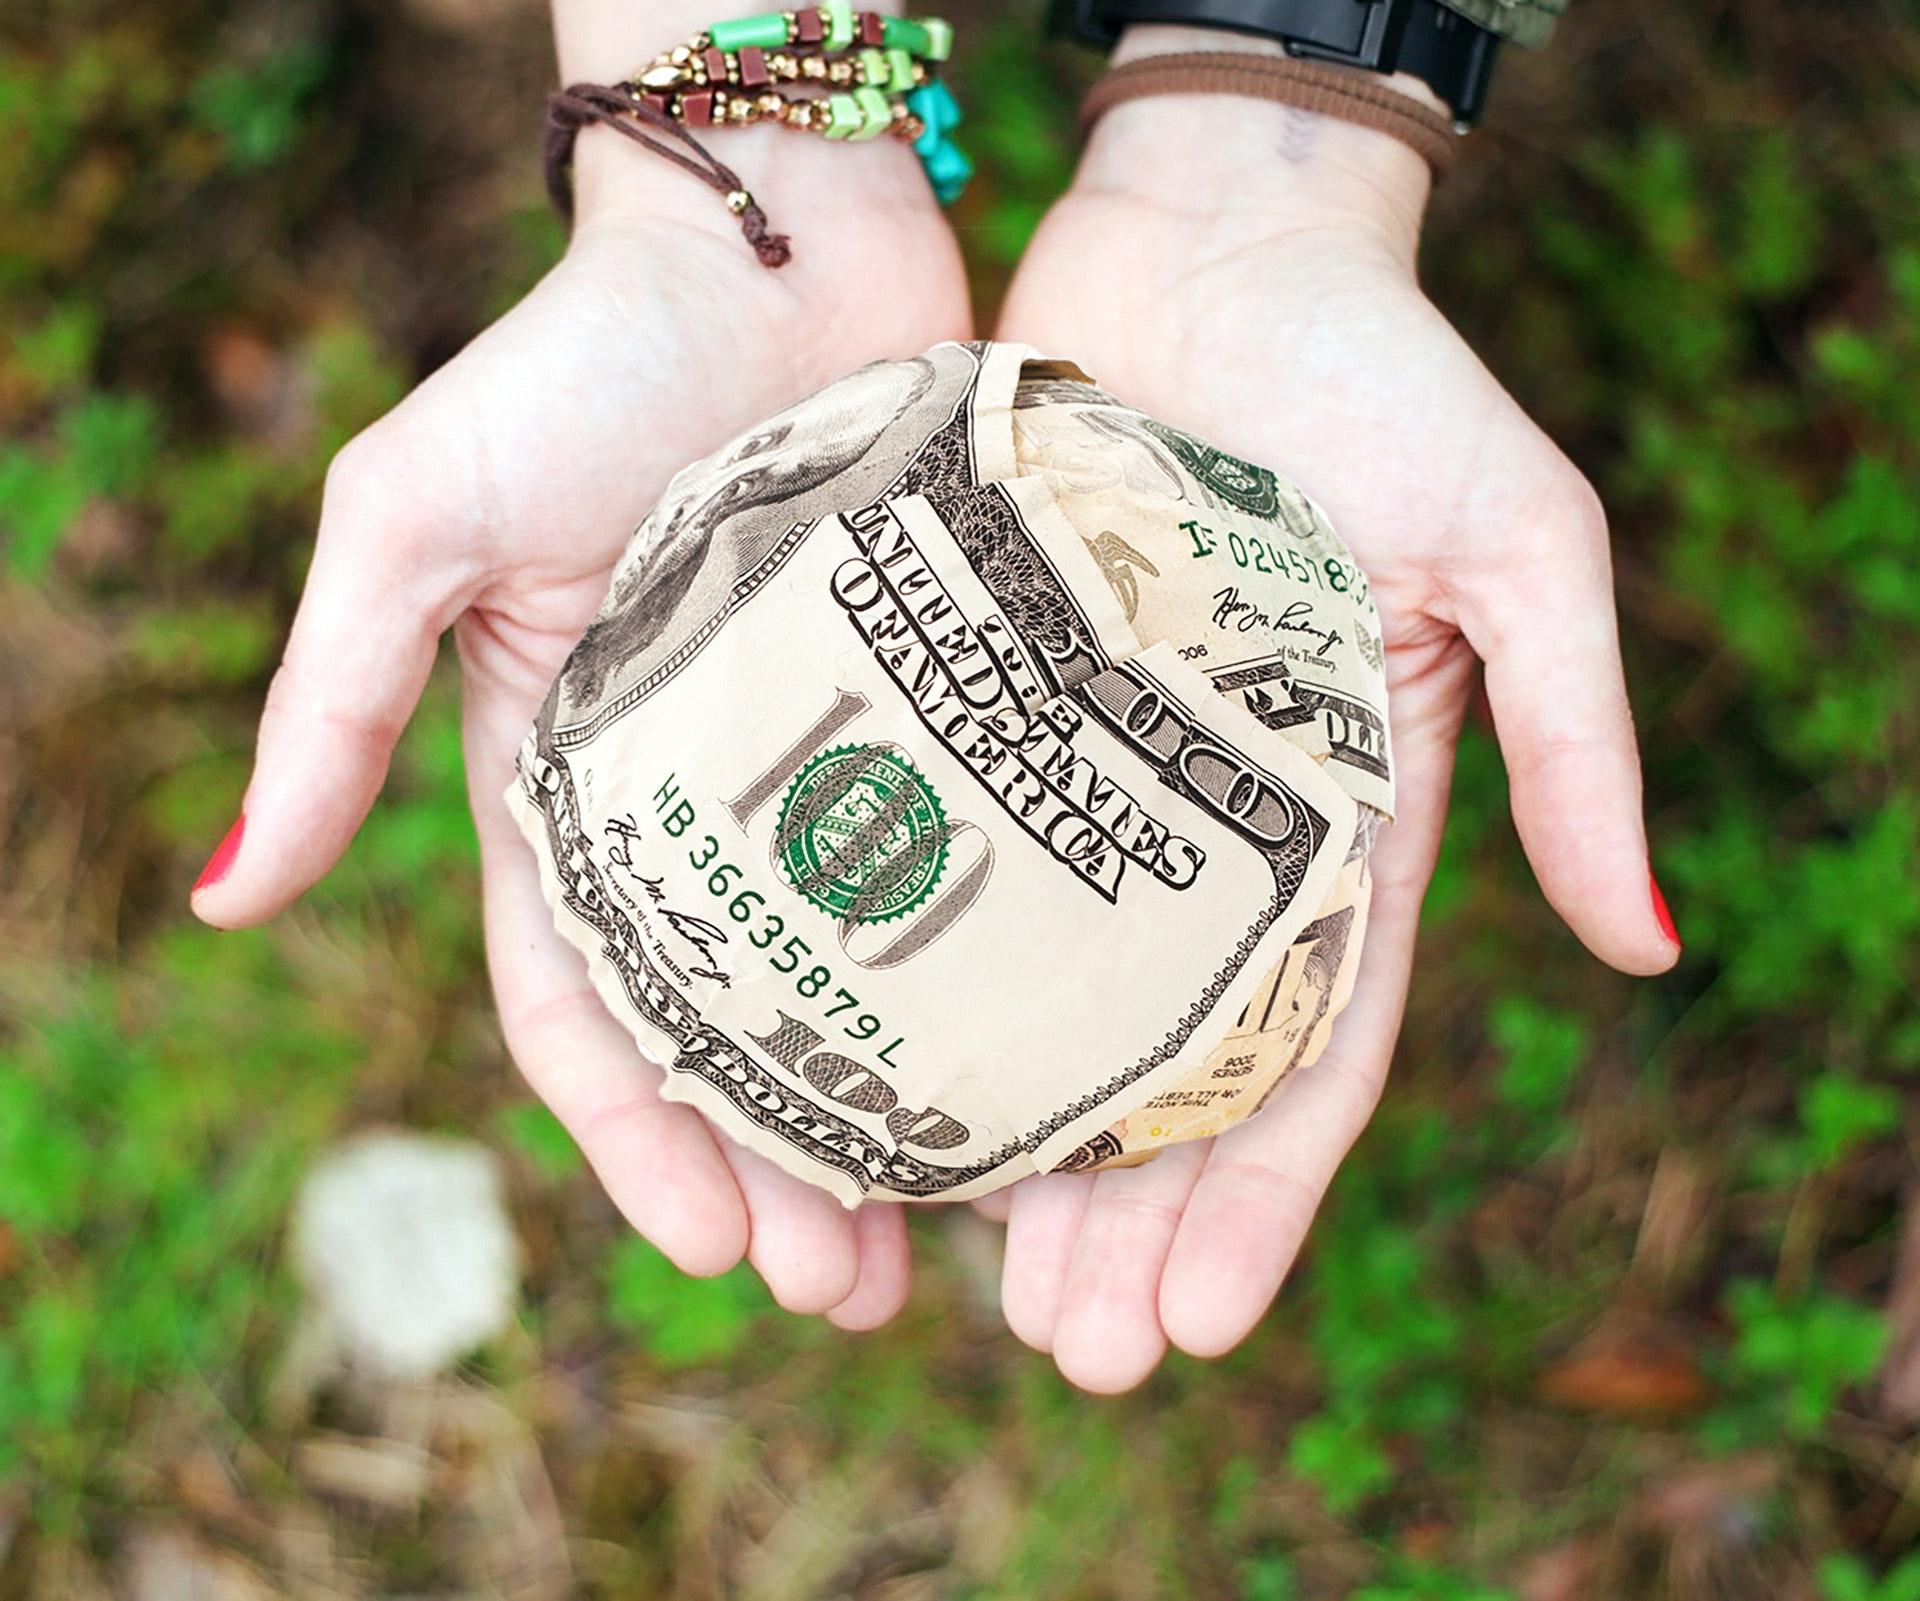 bracelets-cash-crumpled-271168.jpg